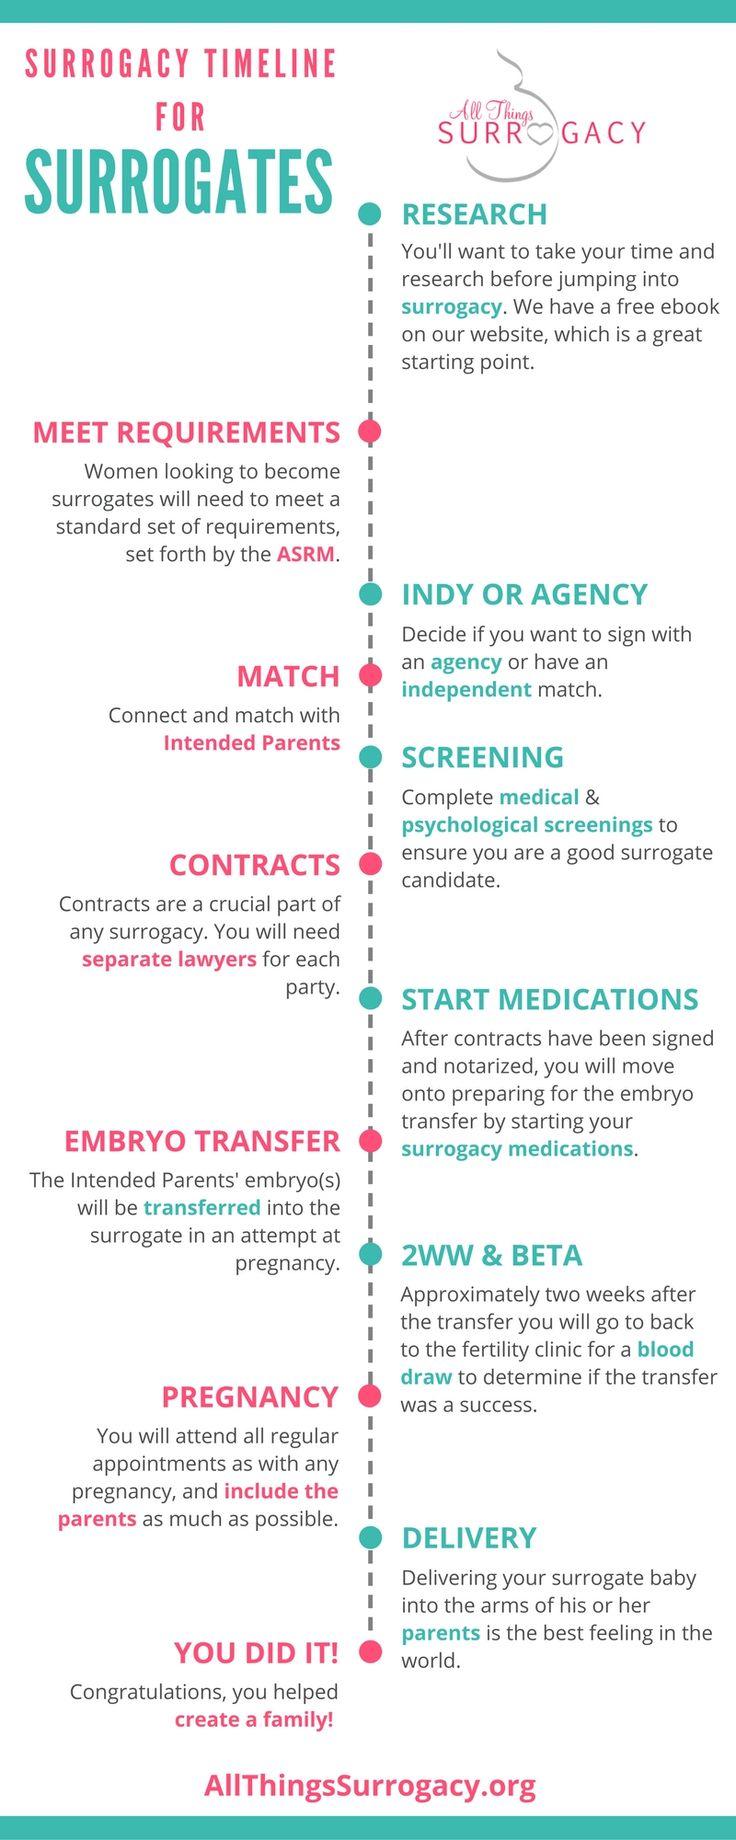 Surrogacy Timeline for Surrogates